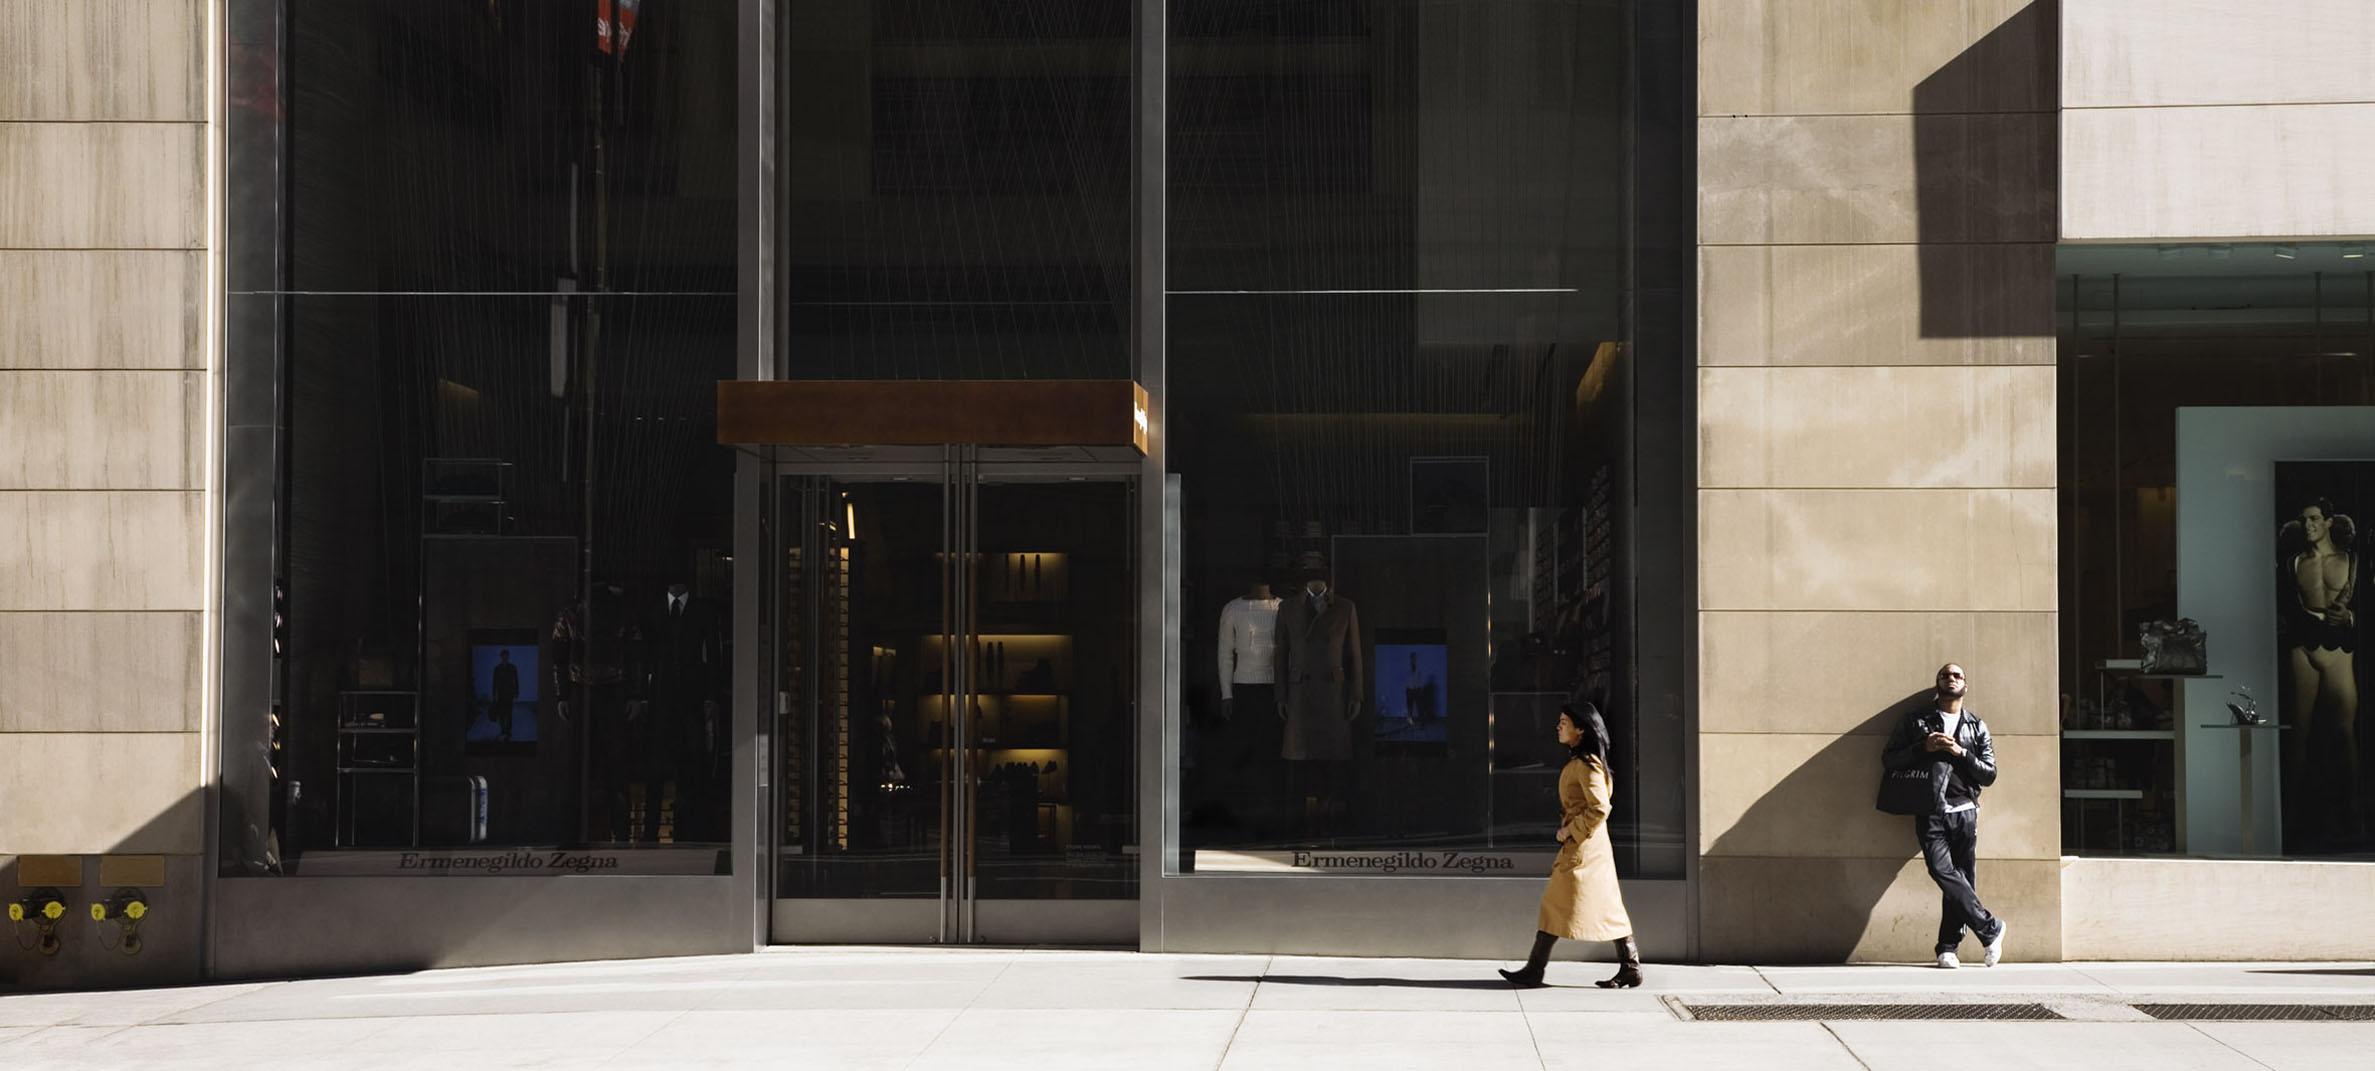 Gudrun Kemsa: Fifth Avenue 3, 2009, 86 x 198 cm, C-Print, Diasec